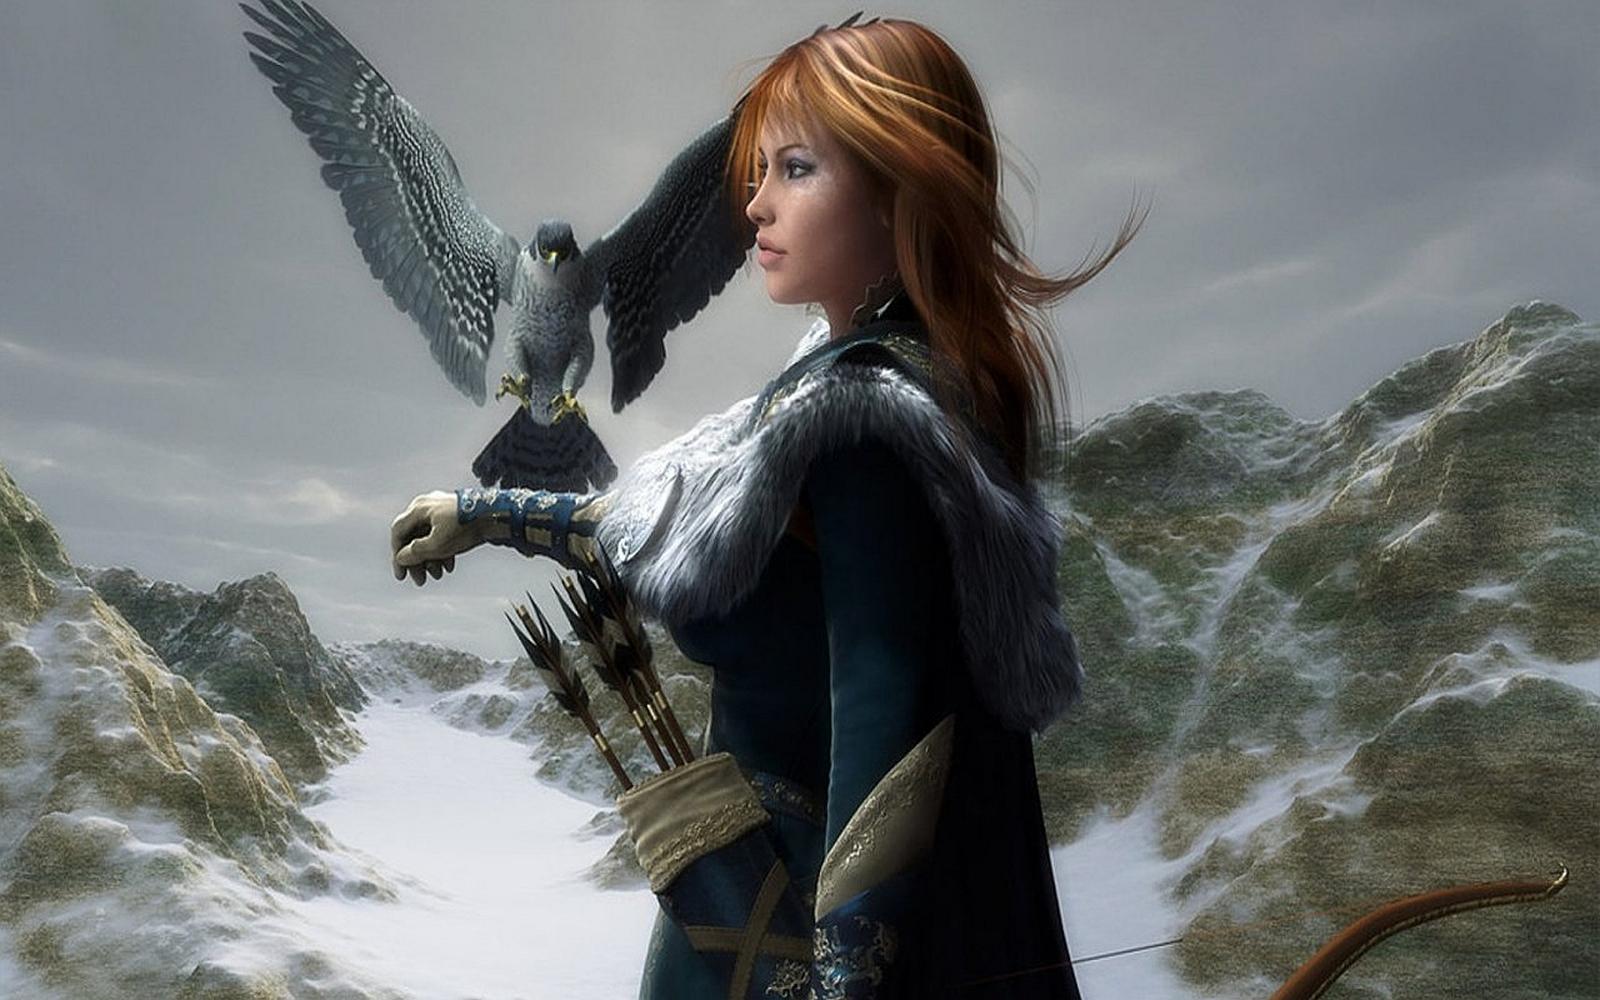 download wallpaper female warrior - photo #11